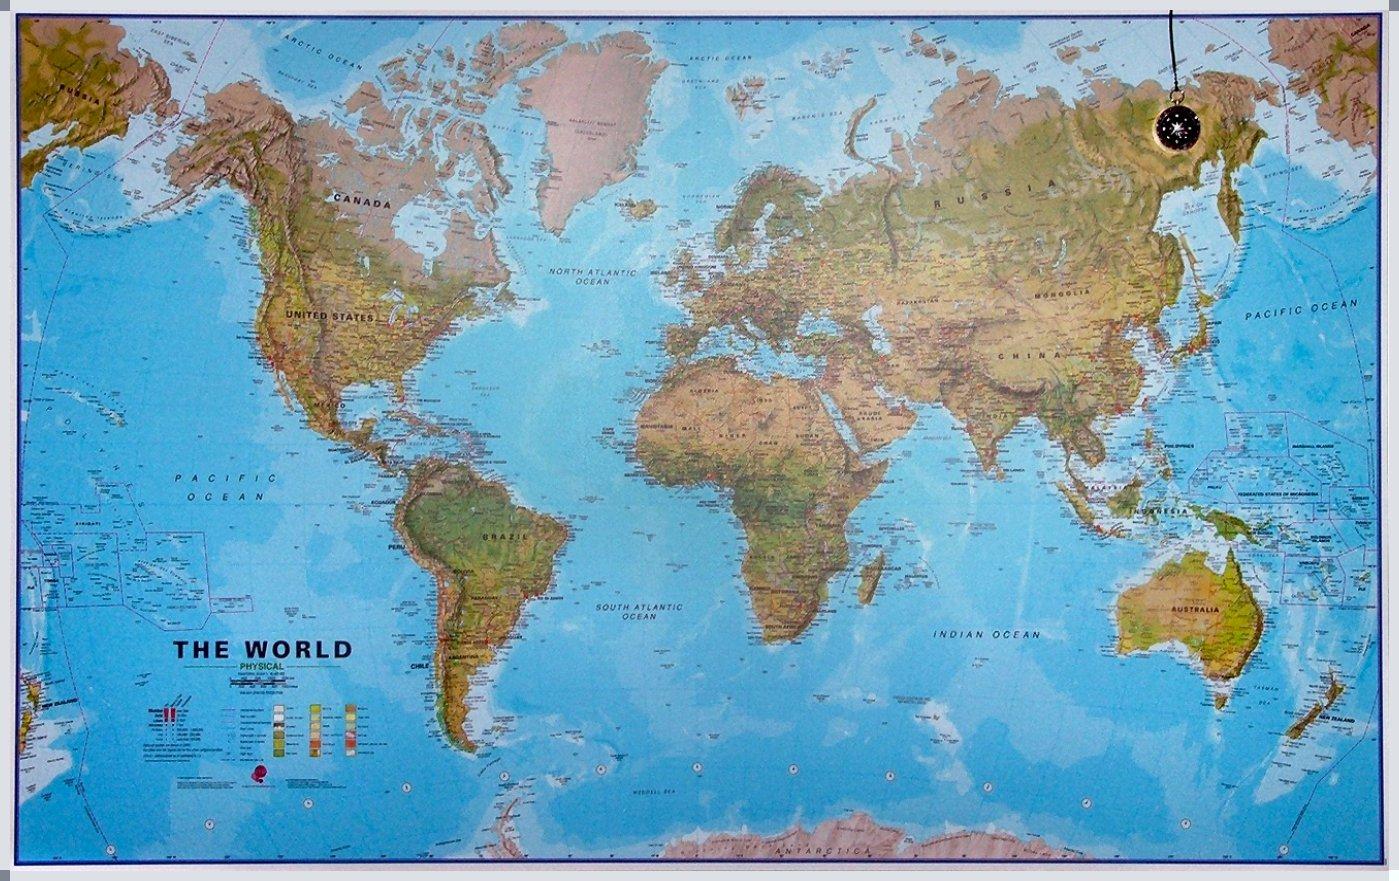 Maps International The World Environmental - Large - Magneetbord